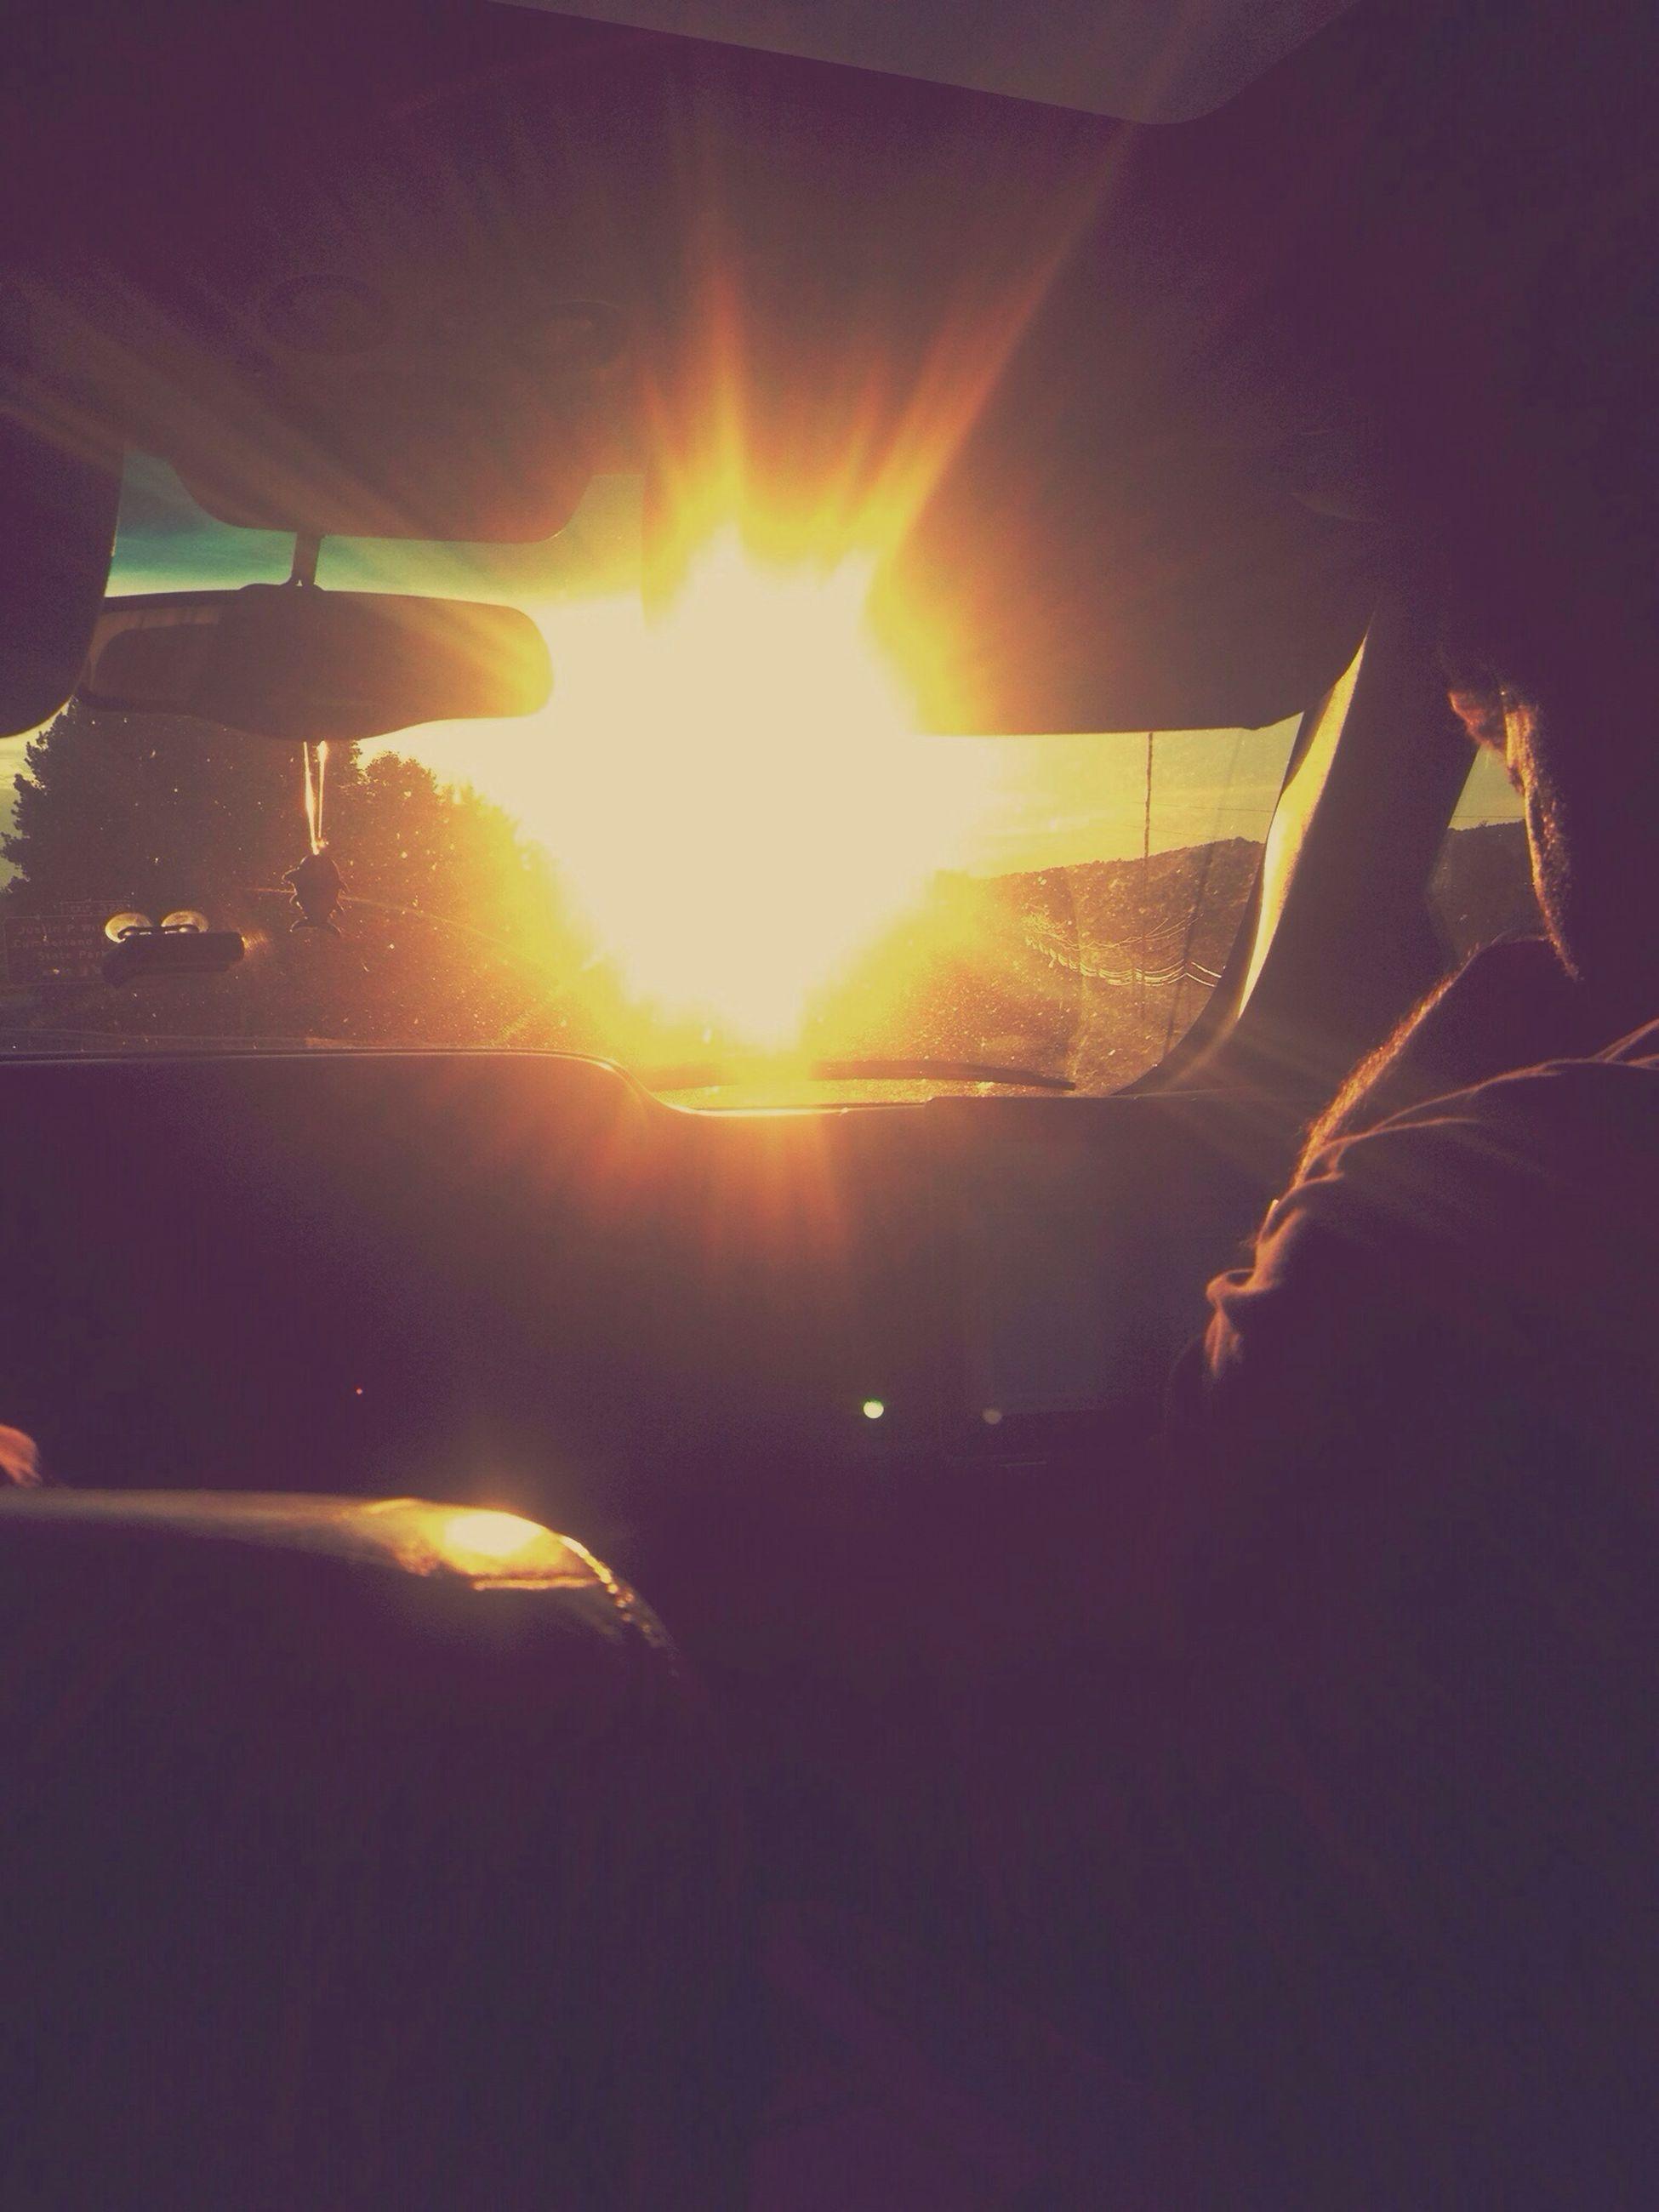 transportation, mode of transport, land vehicle, part of, unrecognizable person, leisure activity, lifestyles, silhouette, person, car, cropped, men, sunlight, lens flare, sunbeam, street, sun